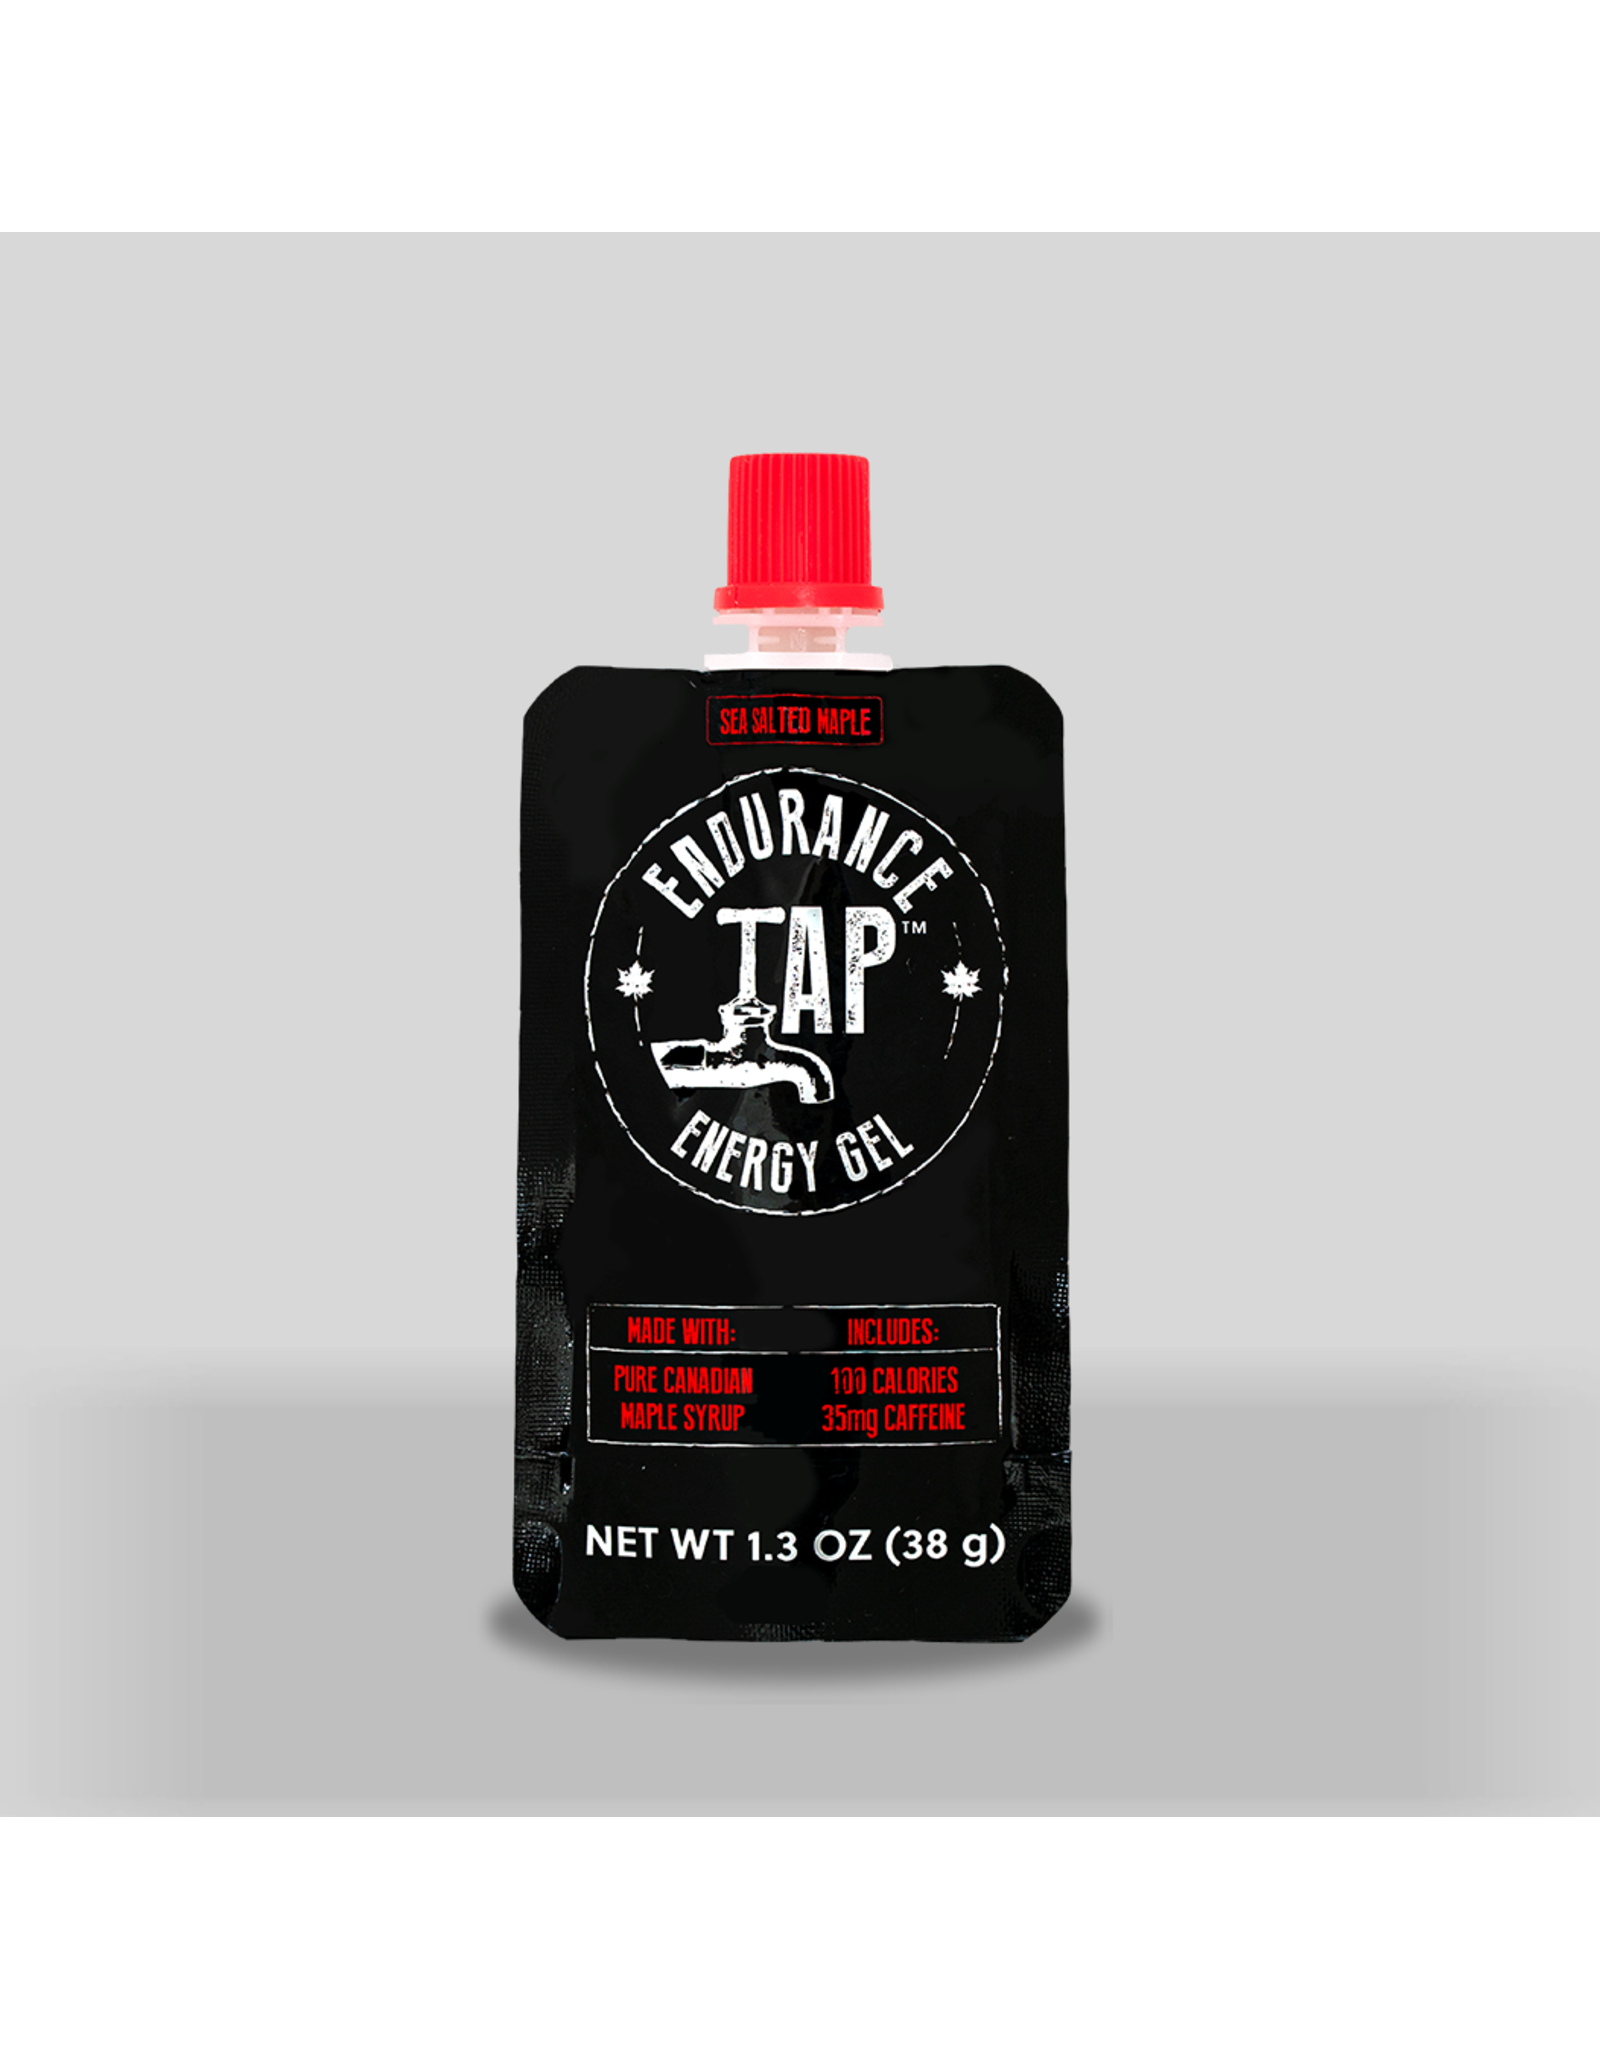 Endurance Tap - Salted Maple Syrup Energy Gel Caffeine Single 38g